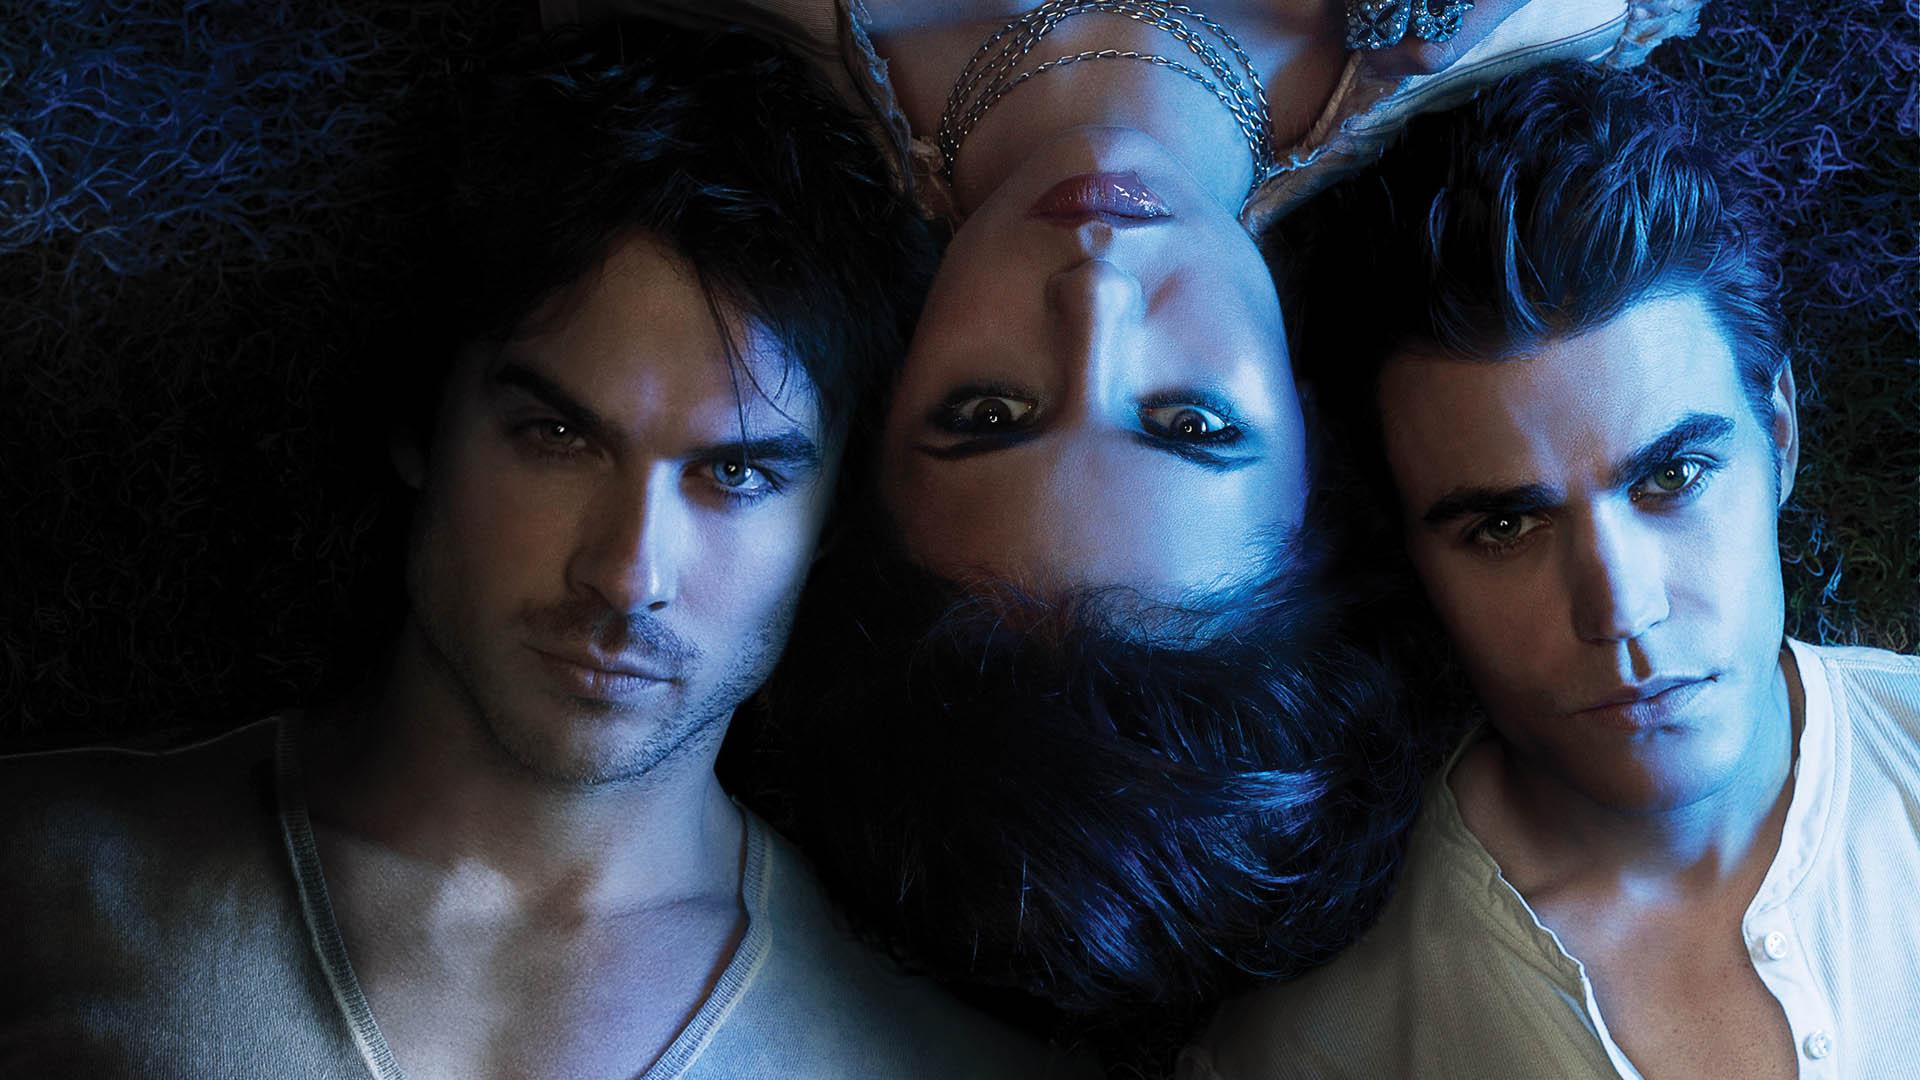 The Vampire Diaries Hd Wallpaper - Vampire Diaries Stefan Elena And Damon , HD Wallpaper & Backgrounds